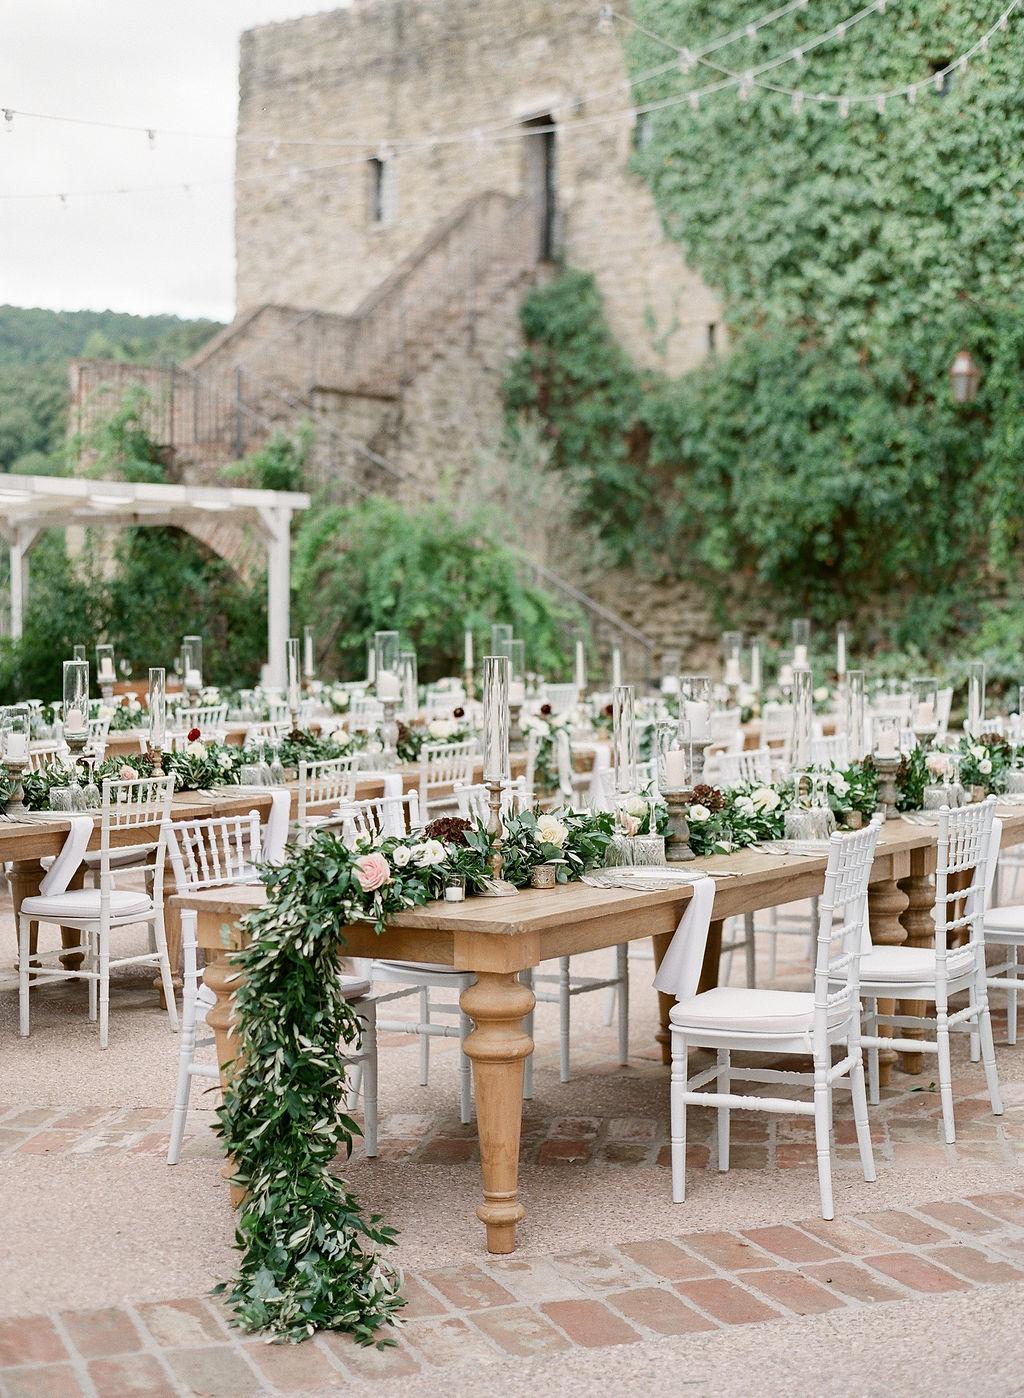 Destination Weddings In Italy In 2020 Italy Wedding Destination Wedding Tuscany Wedding